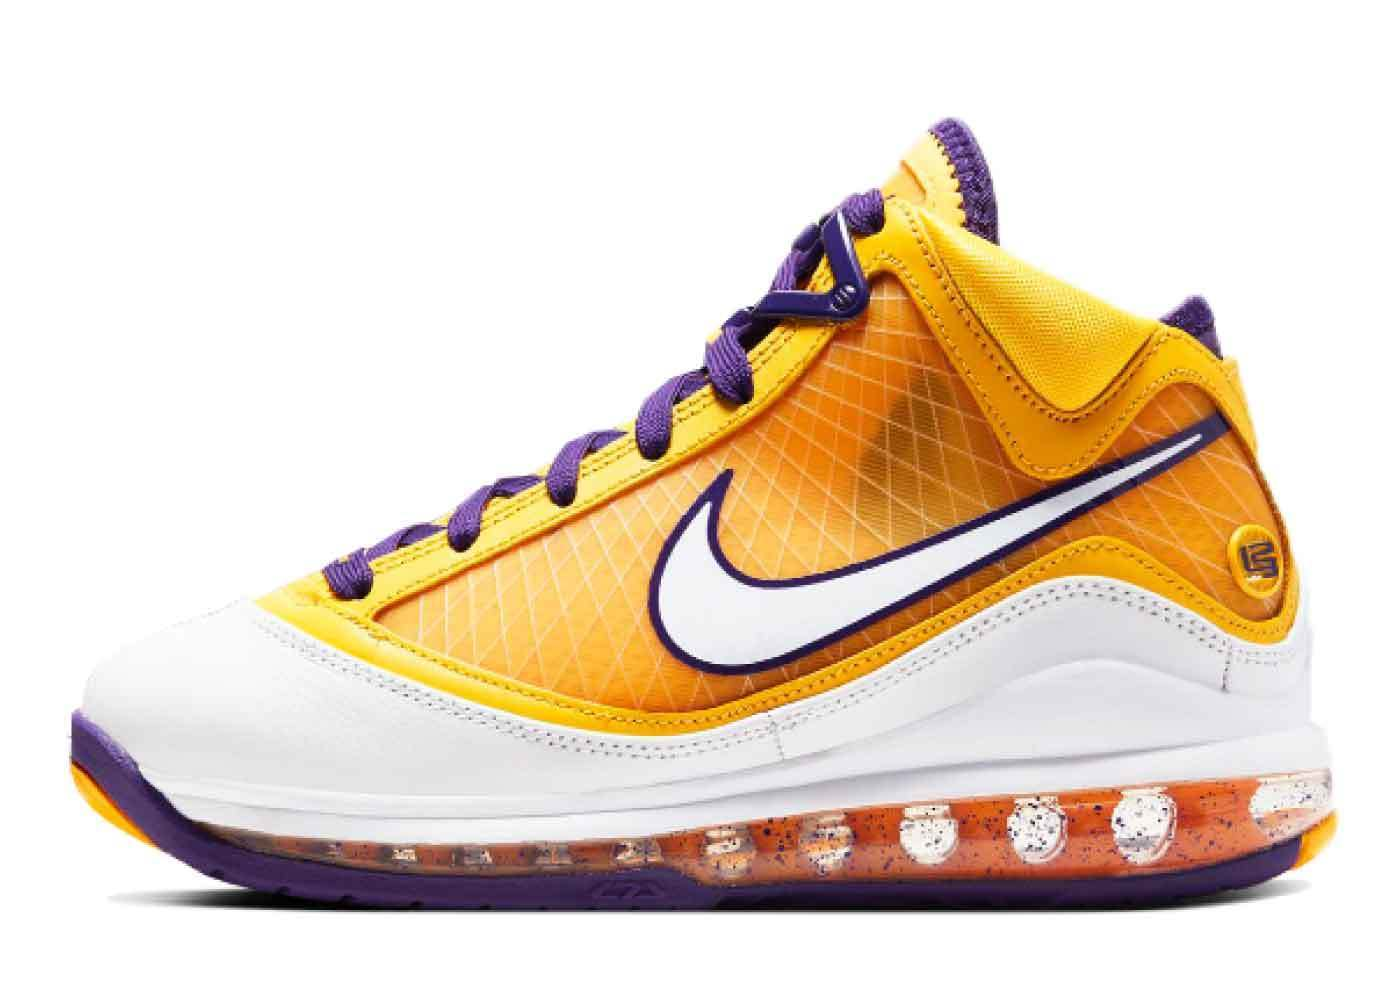 Nike LeBron 7 Lakers Media day(GS)の写真